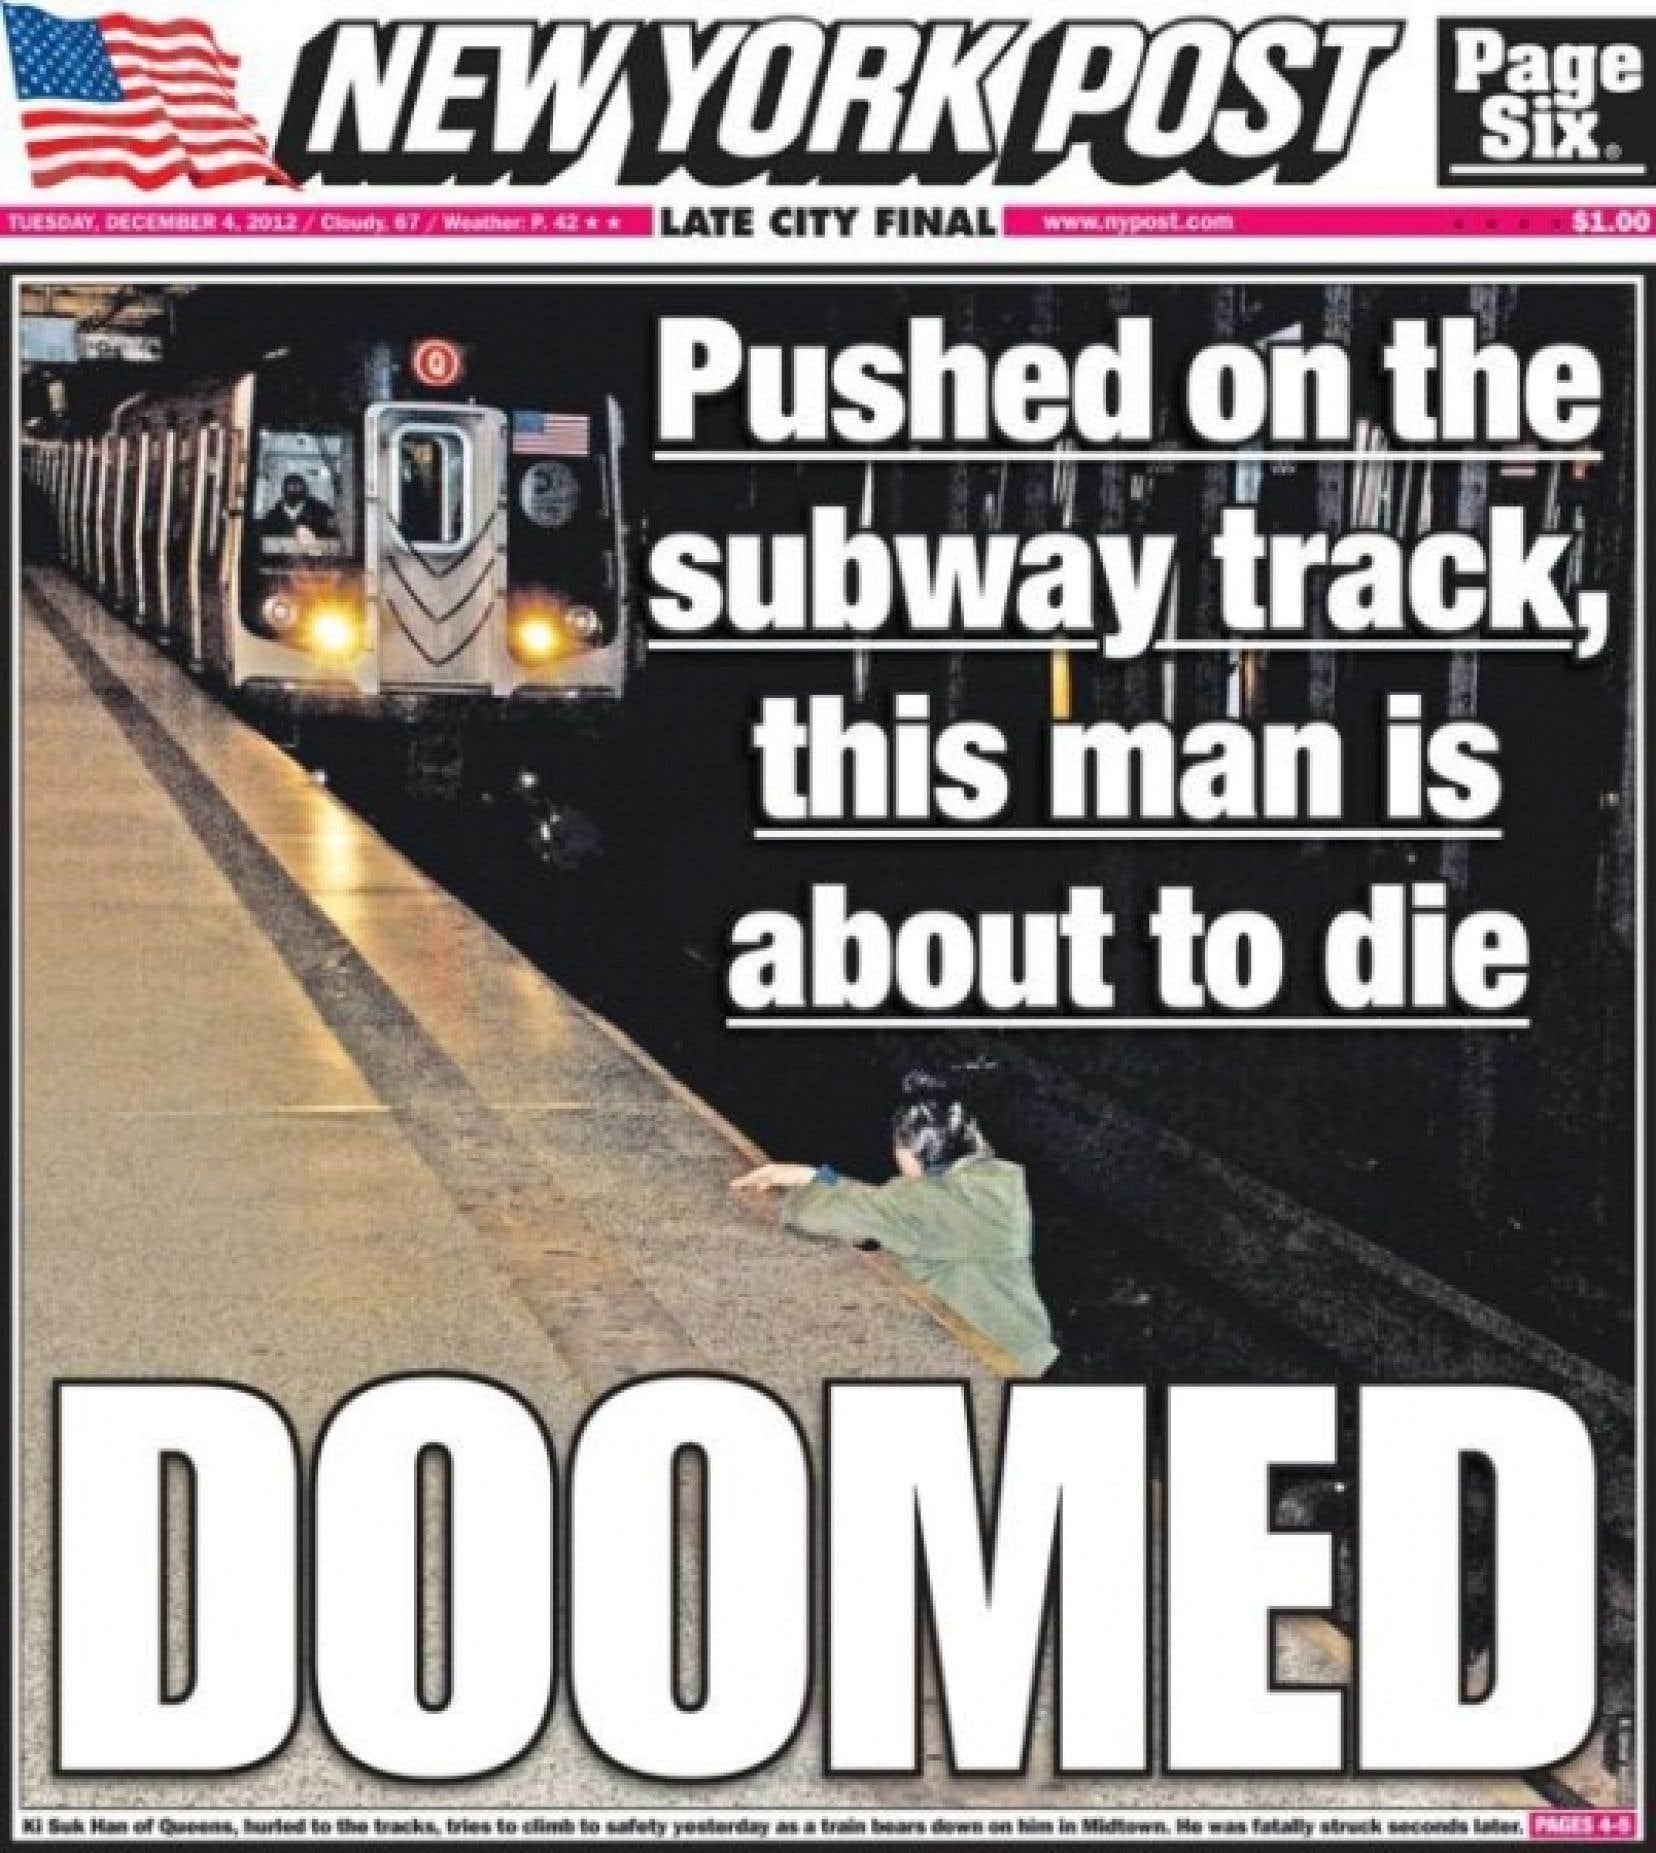 La une du <em>New York Post</em><br />